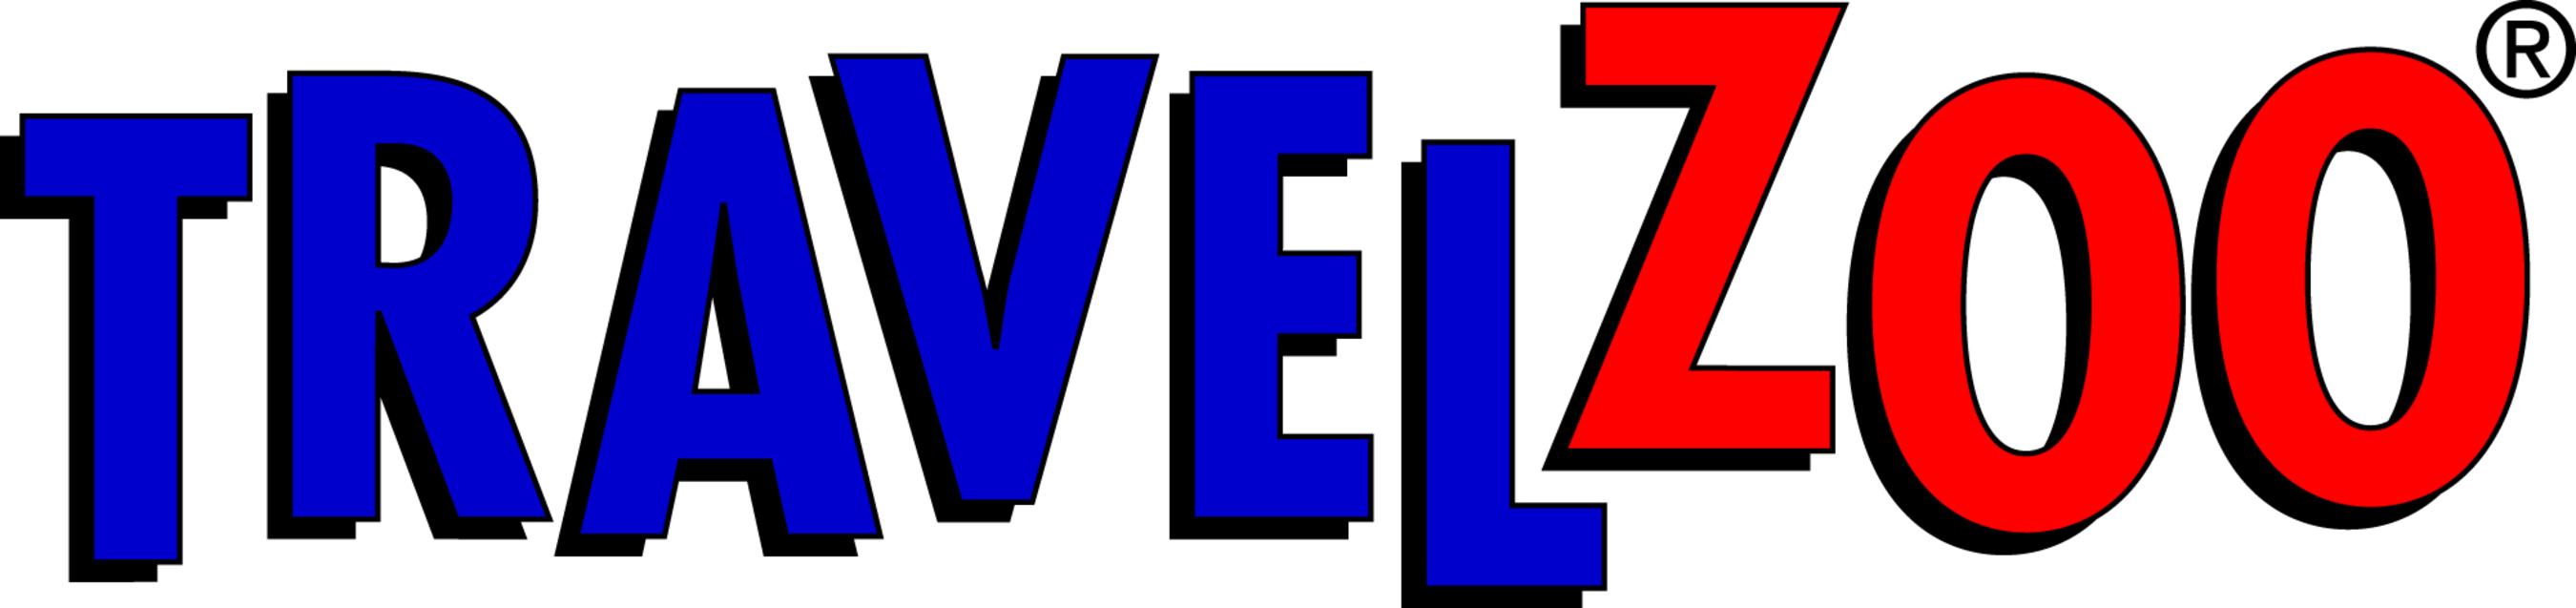 Travelzoo Logo (PRNewsFoto/Travelzoo) (PRNewsFoto/Travelzoo)